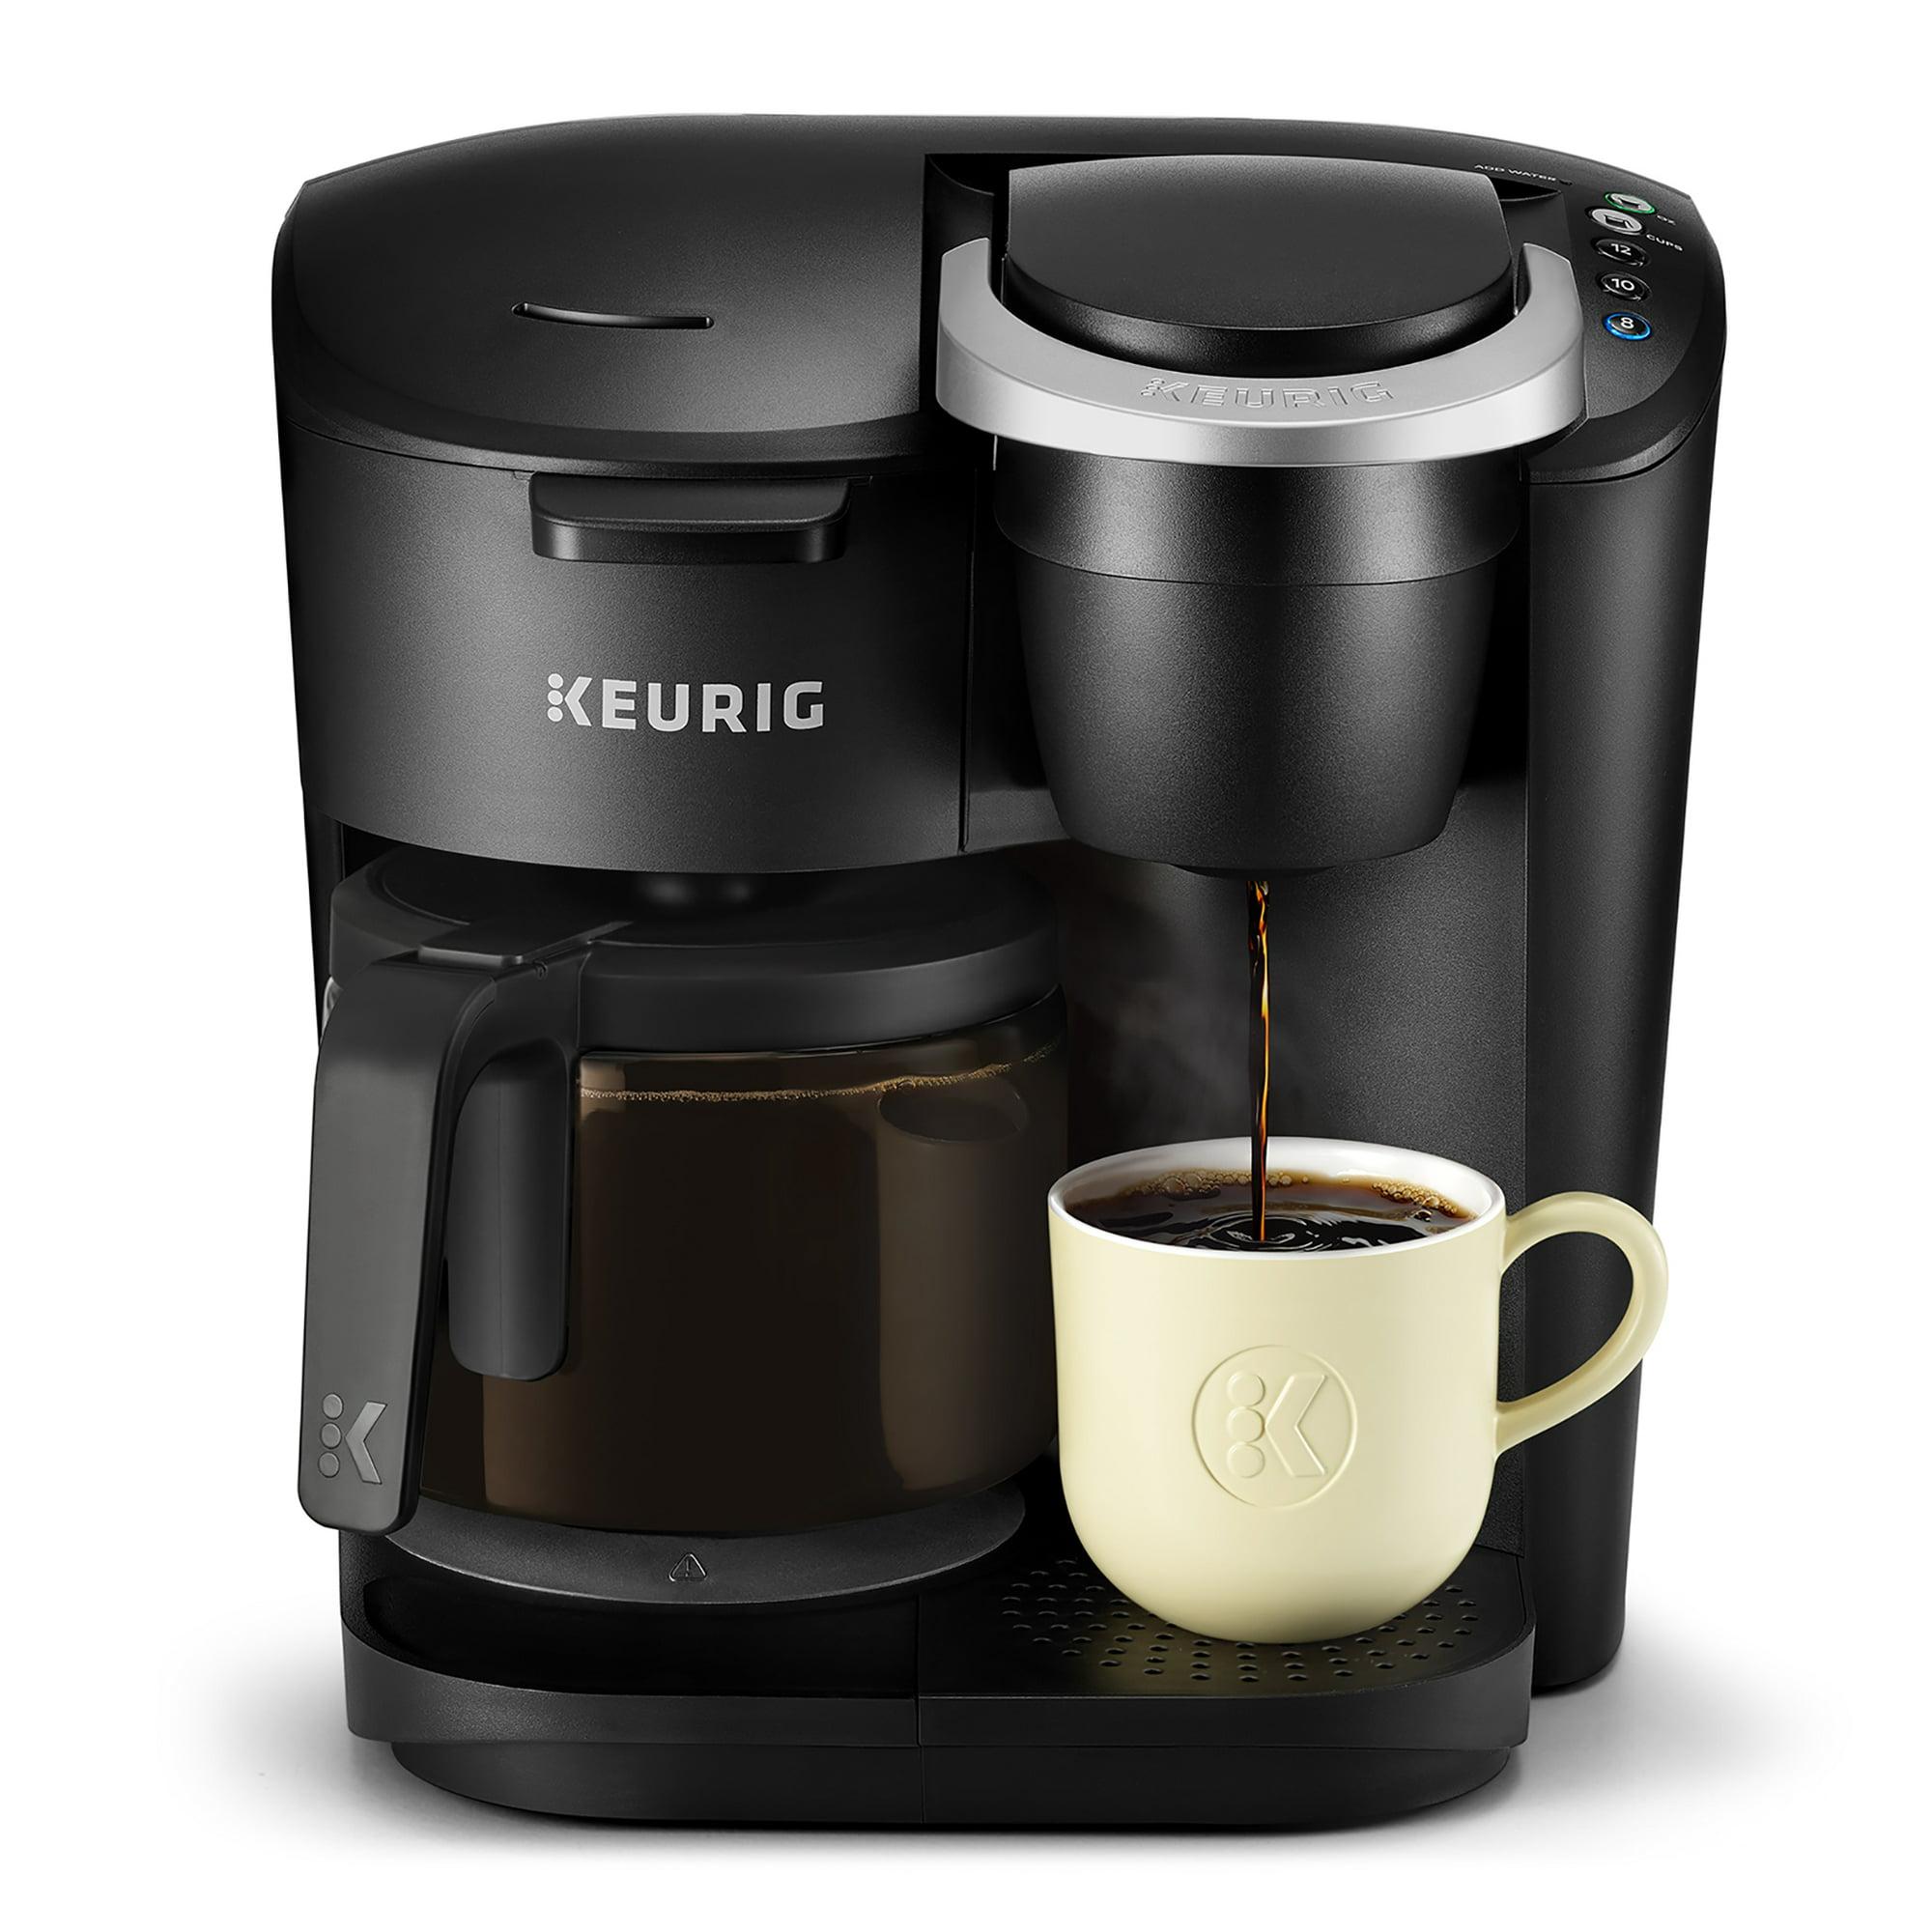 Keurig K Duo Essentials Coffee Maker With Single Serve K Cup Pod And 12 Cup Carafe Brewer Black Walmart Com Walmart Com